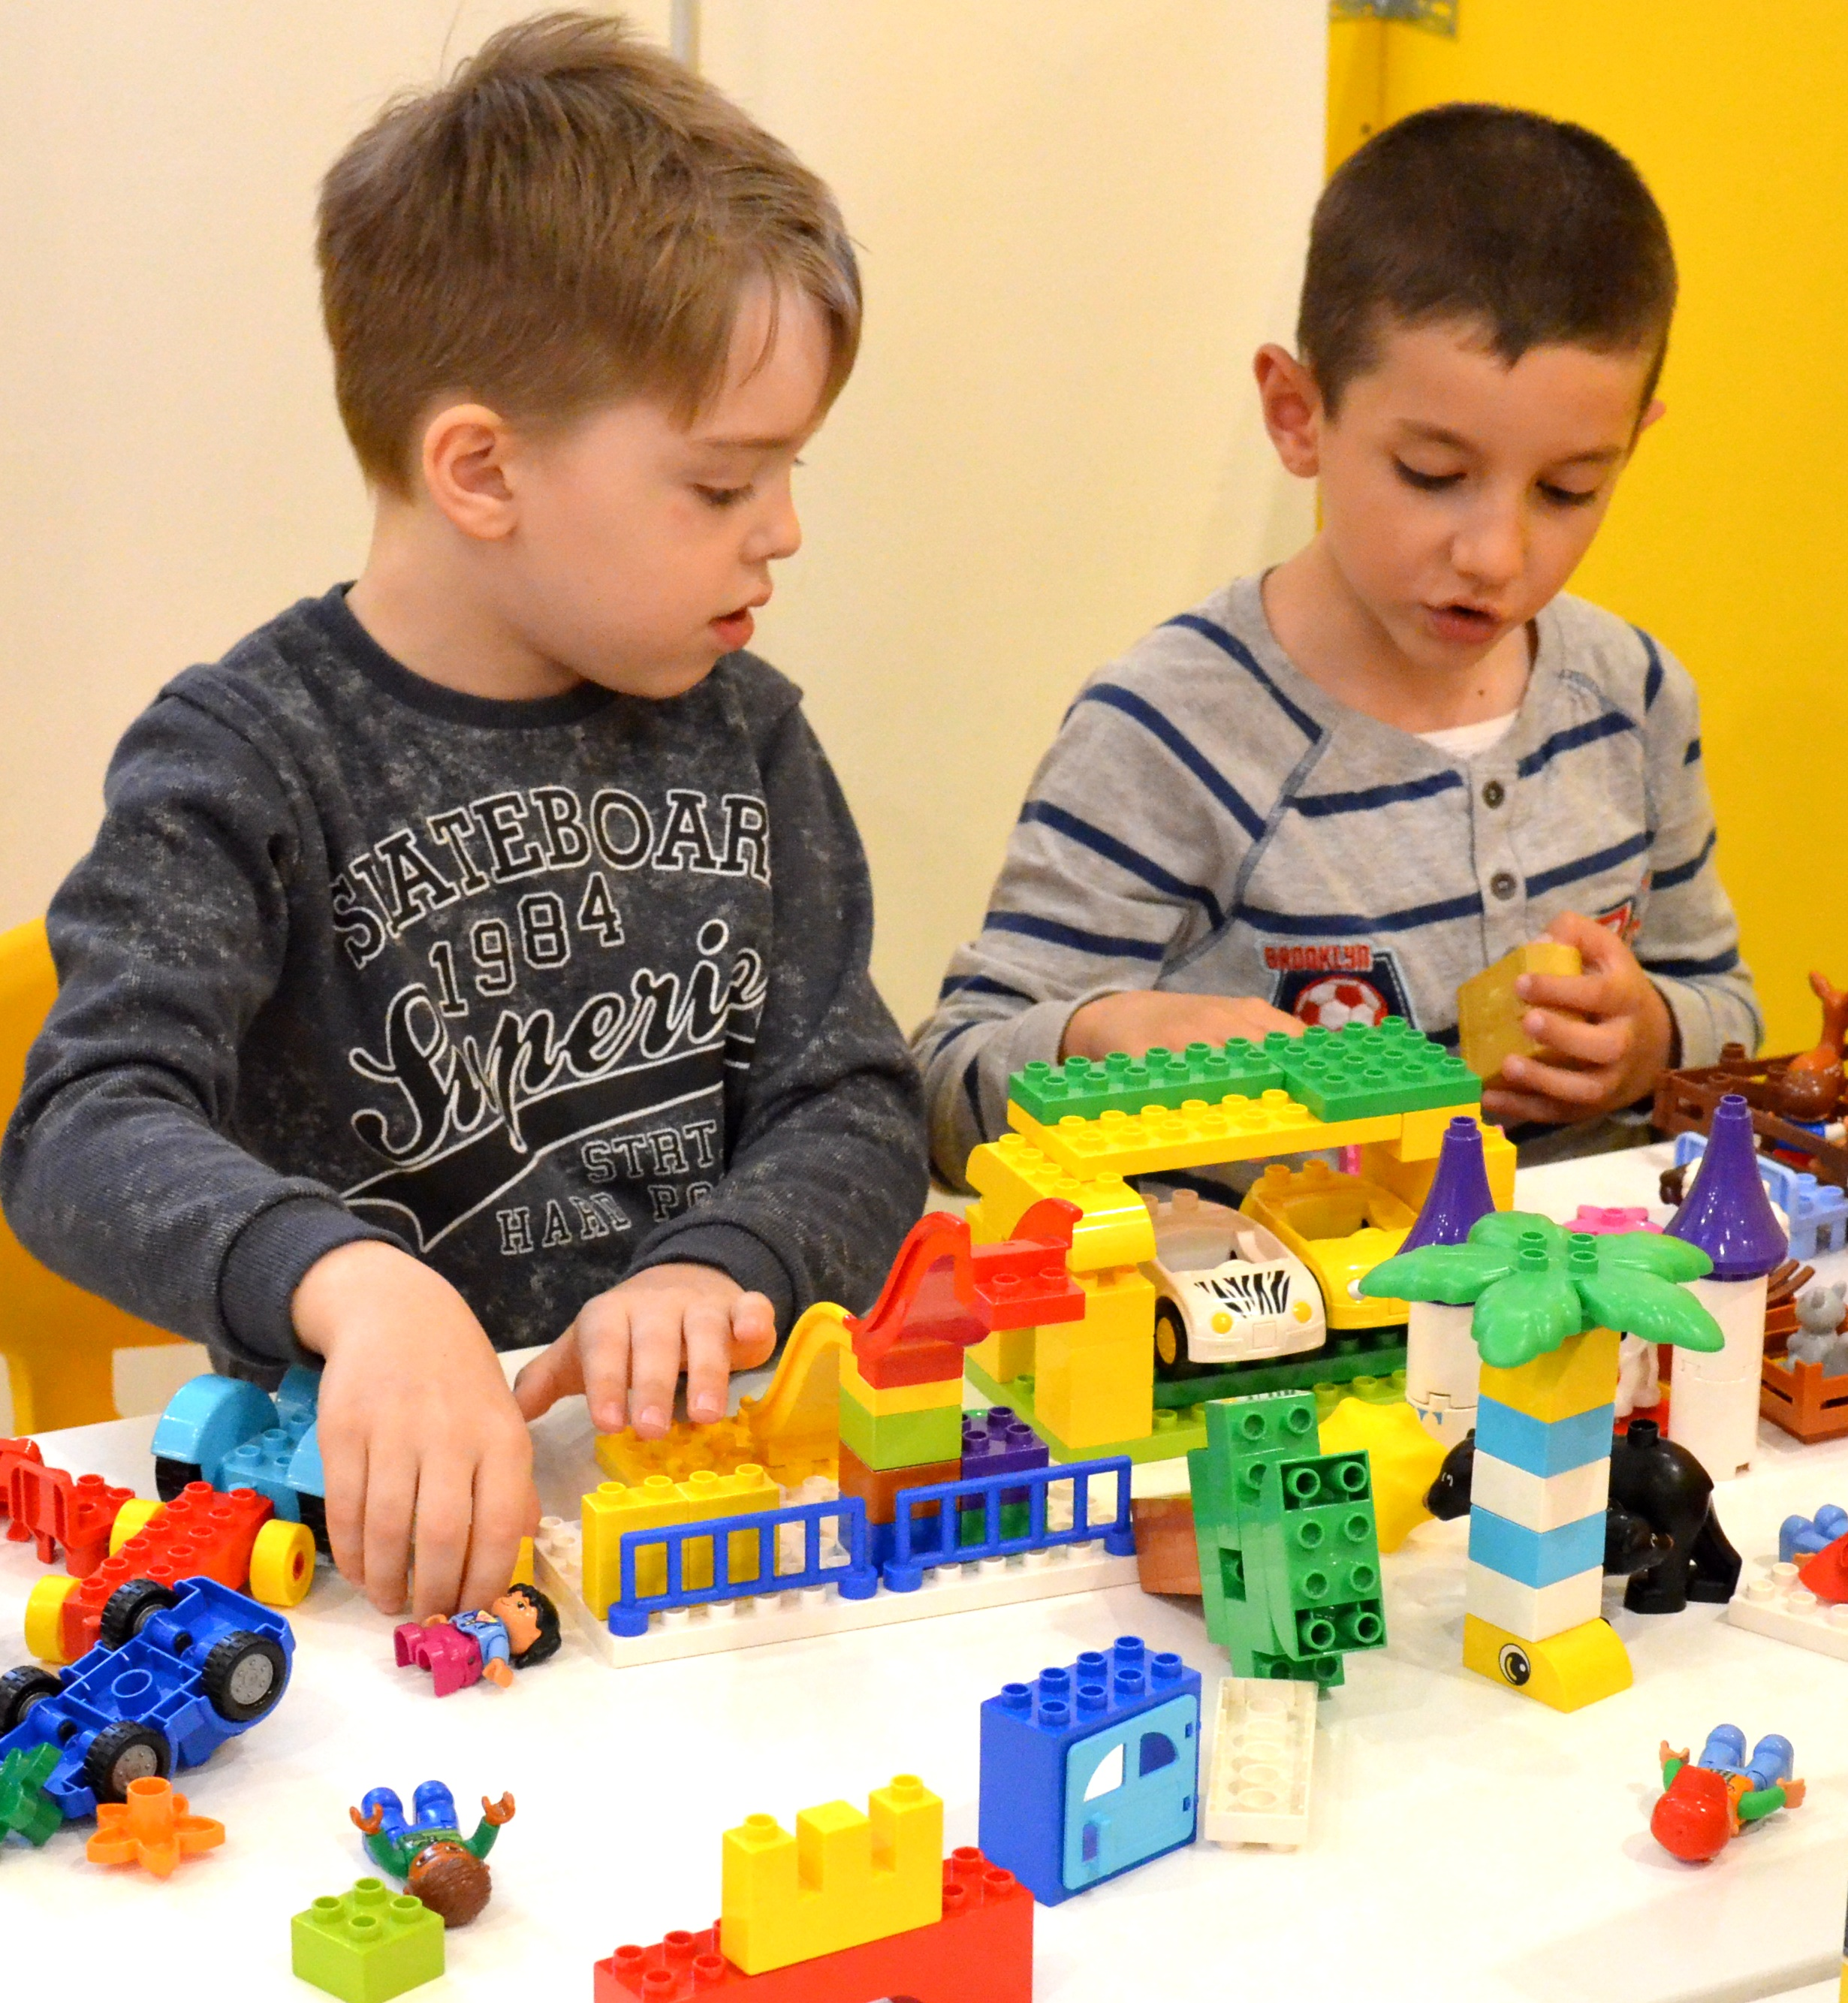 Lego+town+felicia+iasi+2017